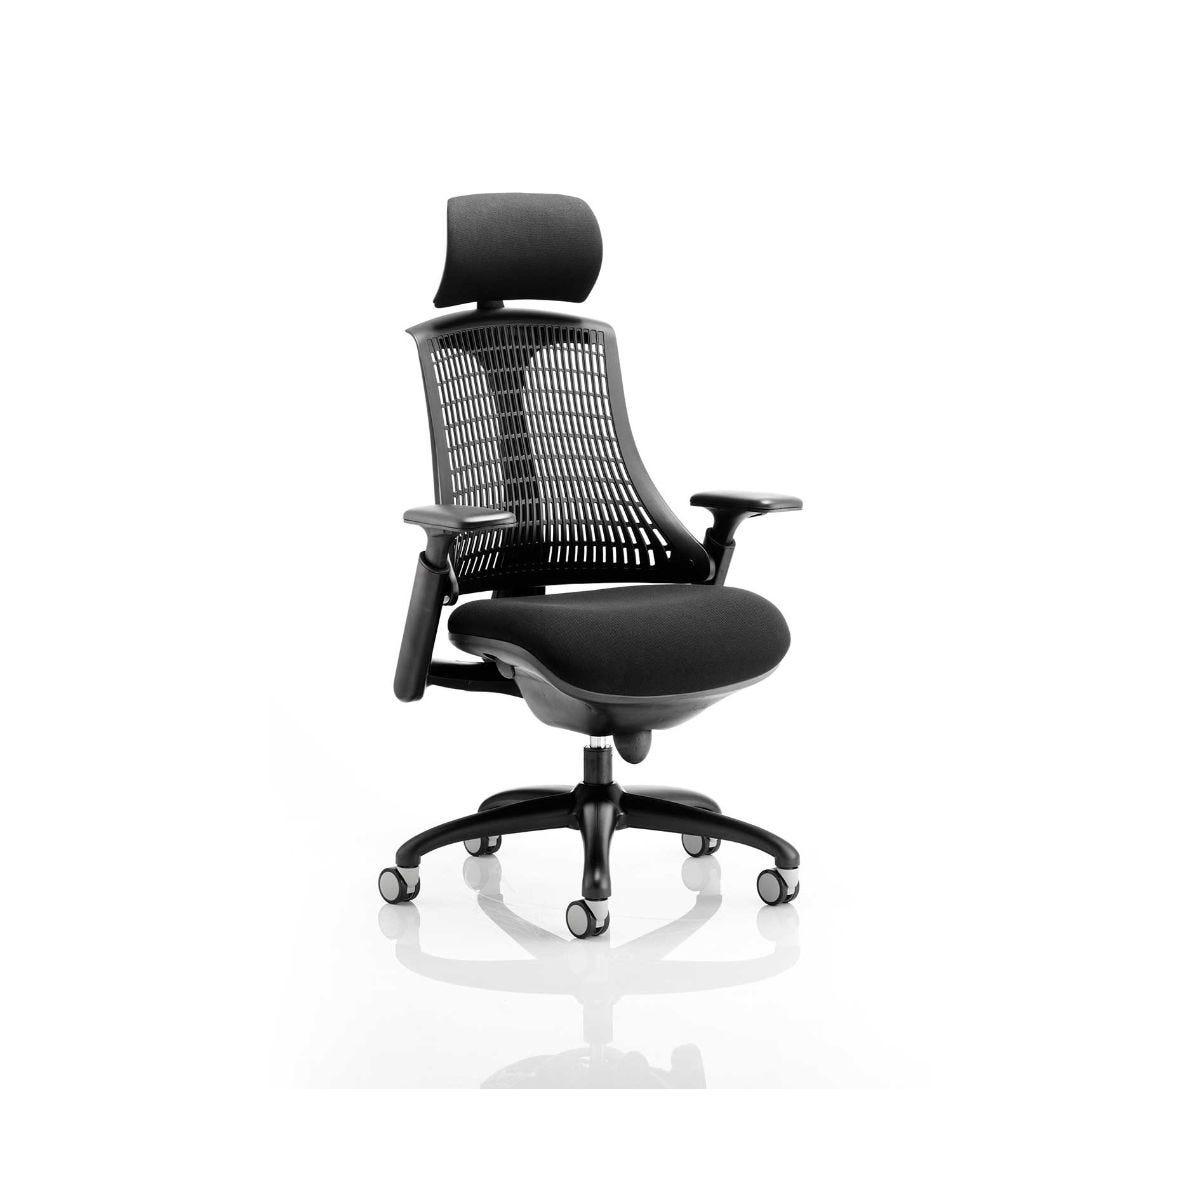 Flex Task Operator Office Chair With Headrest, Black